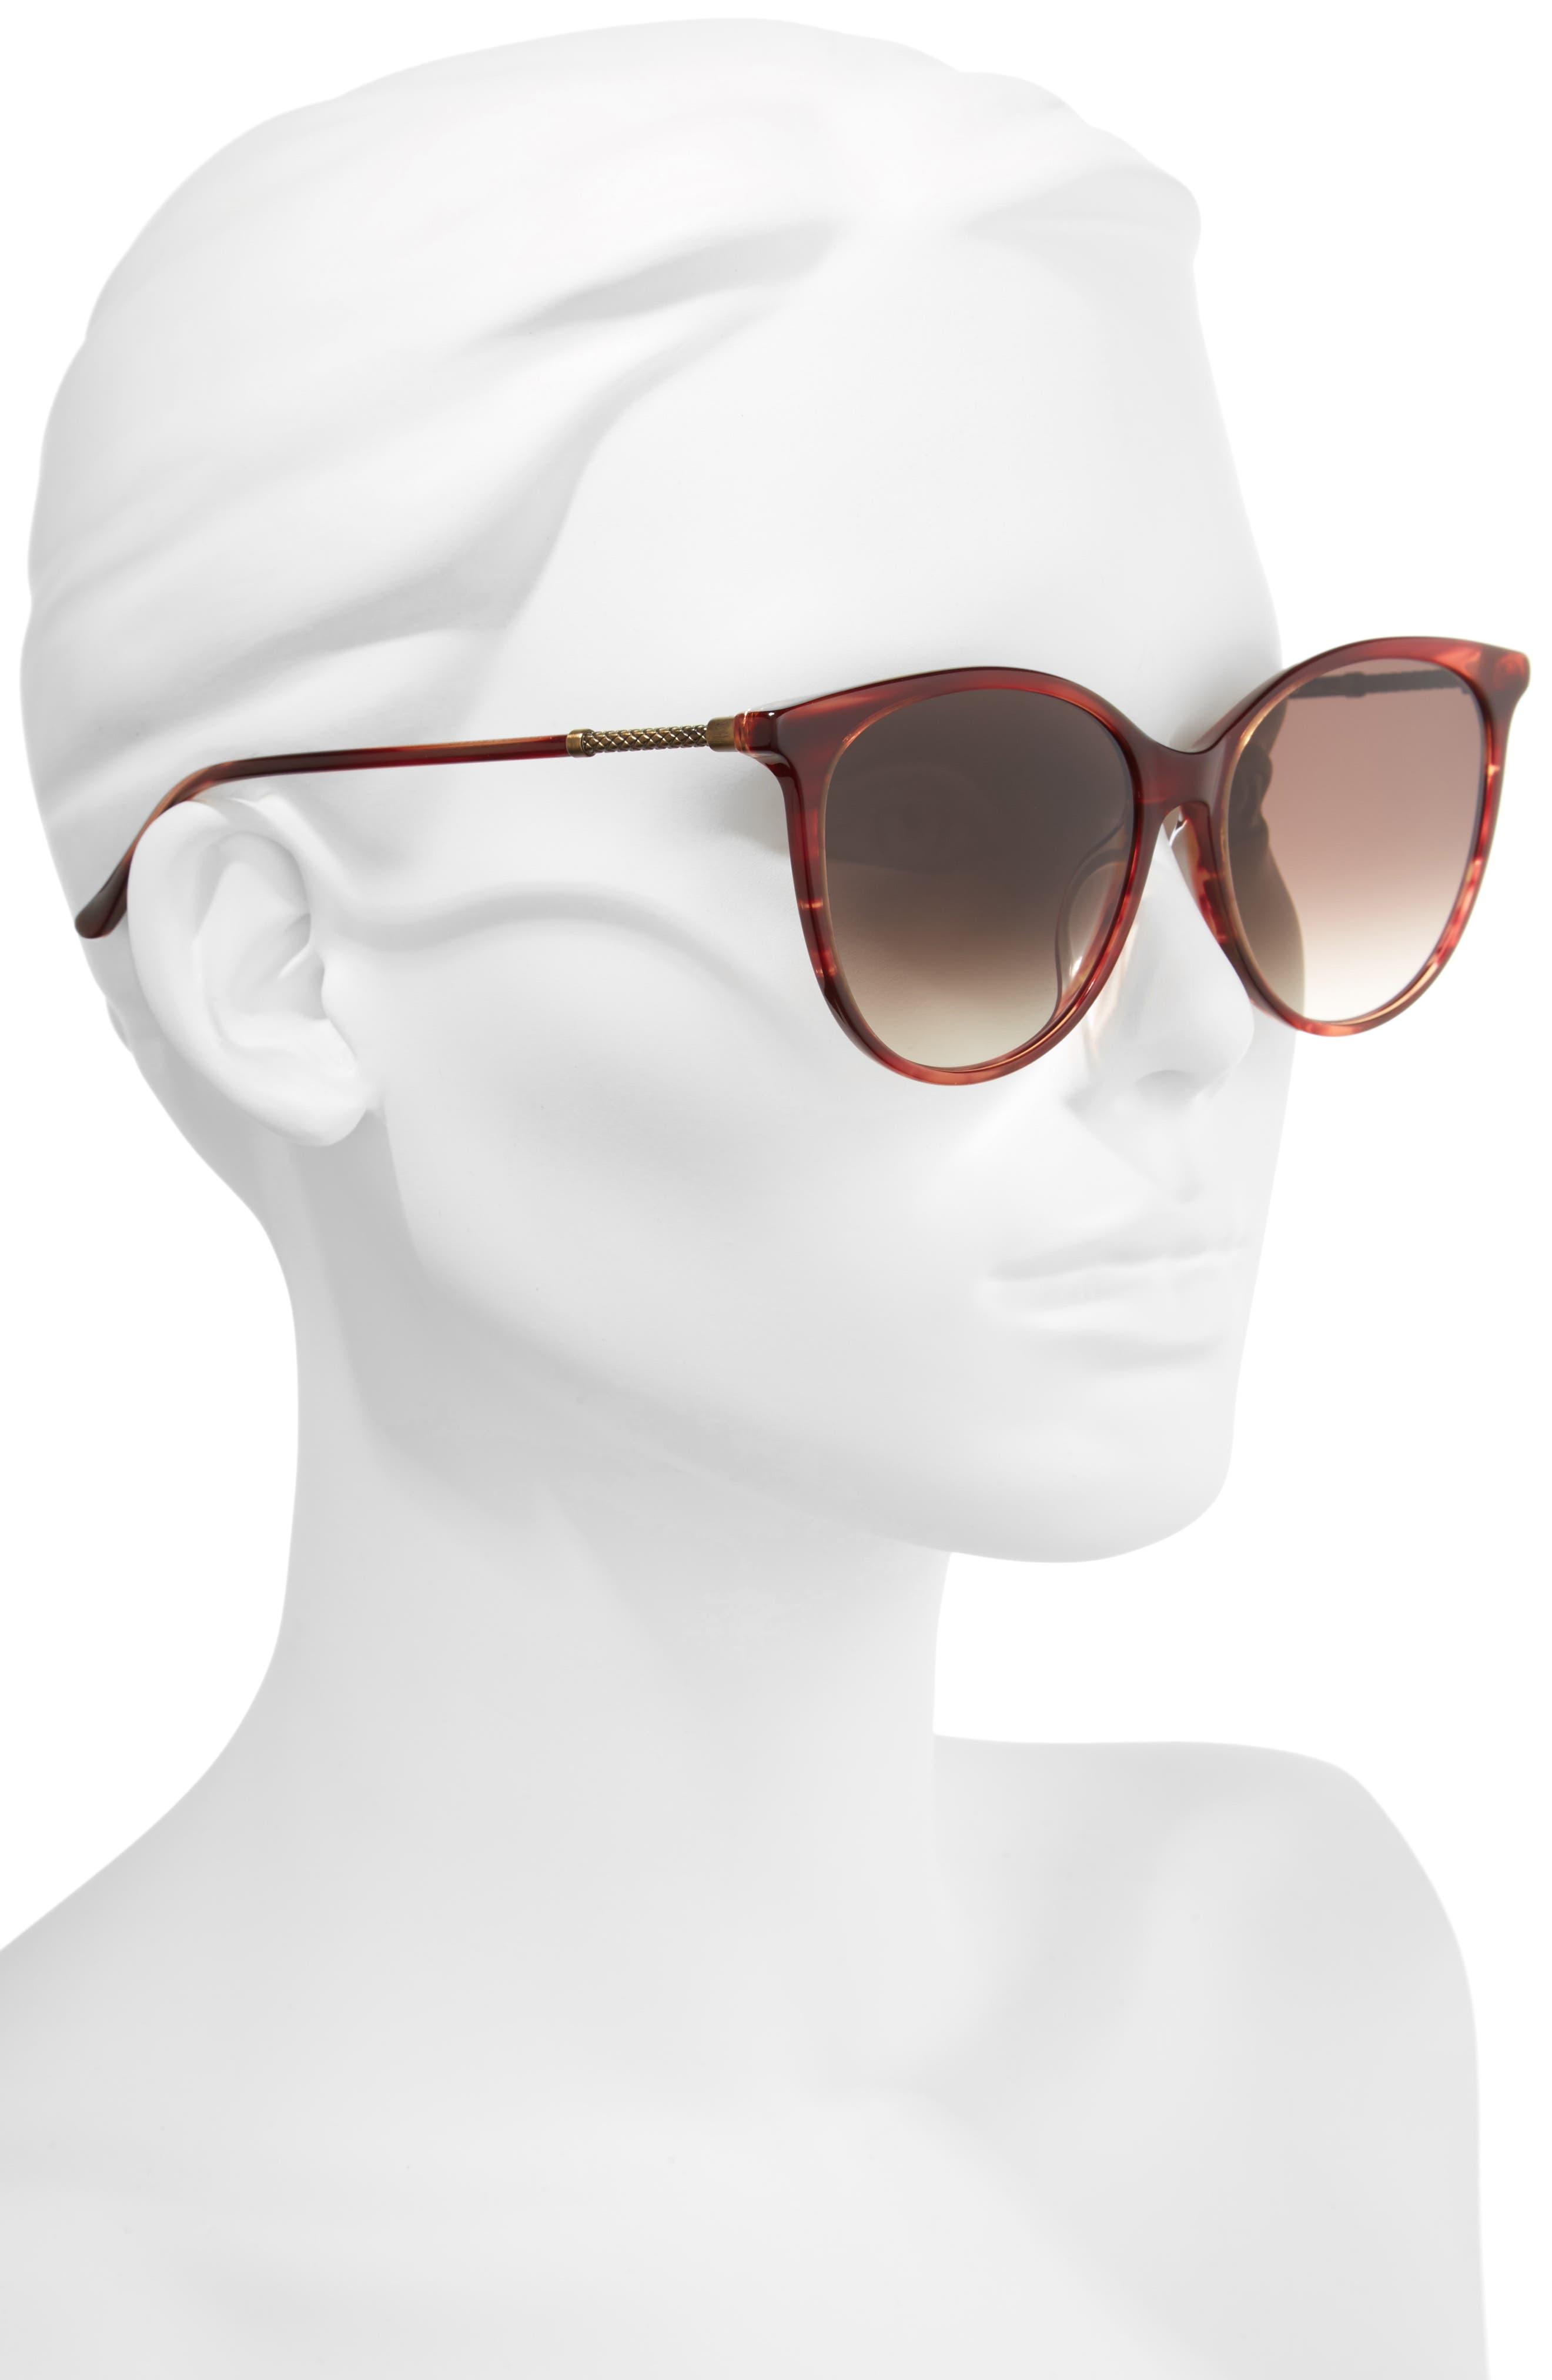 57mm Cat Eye Sunglasses,                             Alternate thumbnail 8, color,